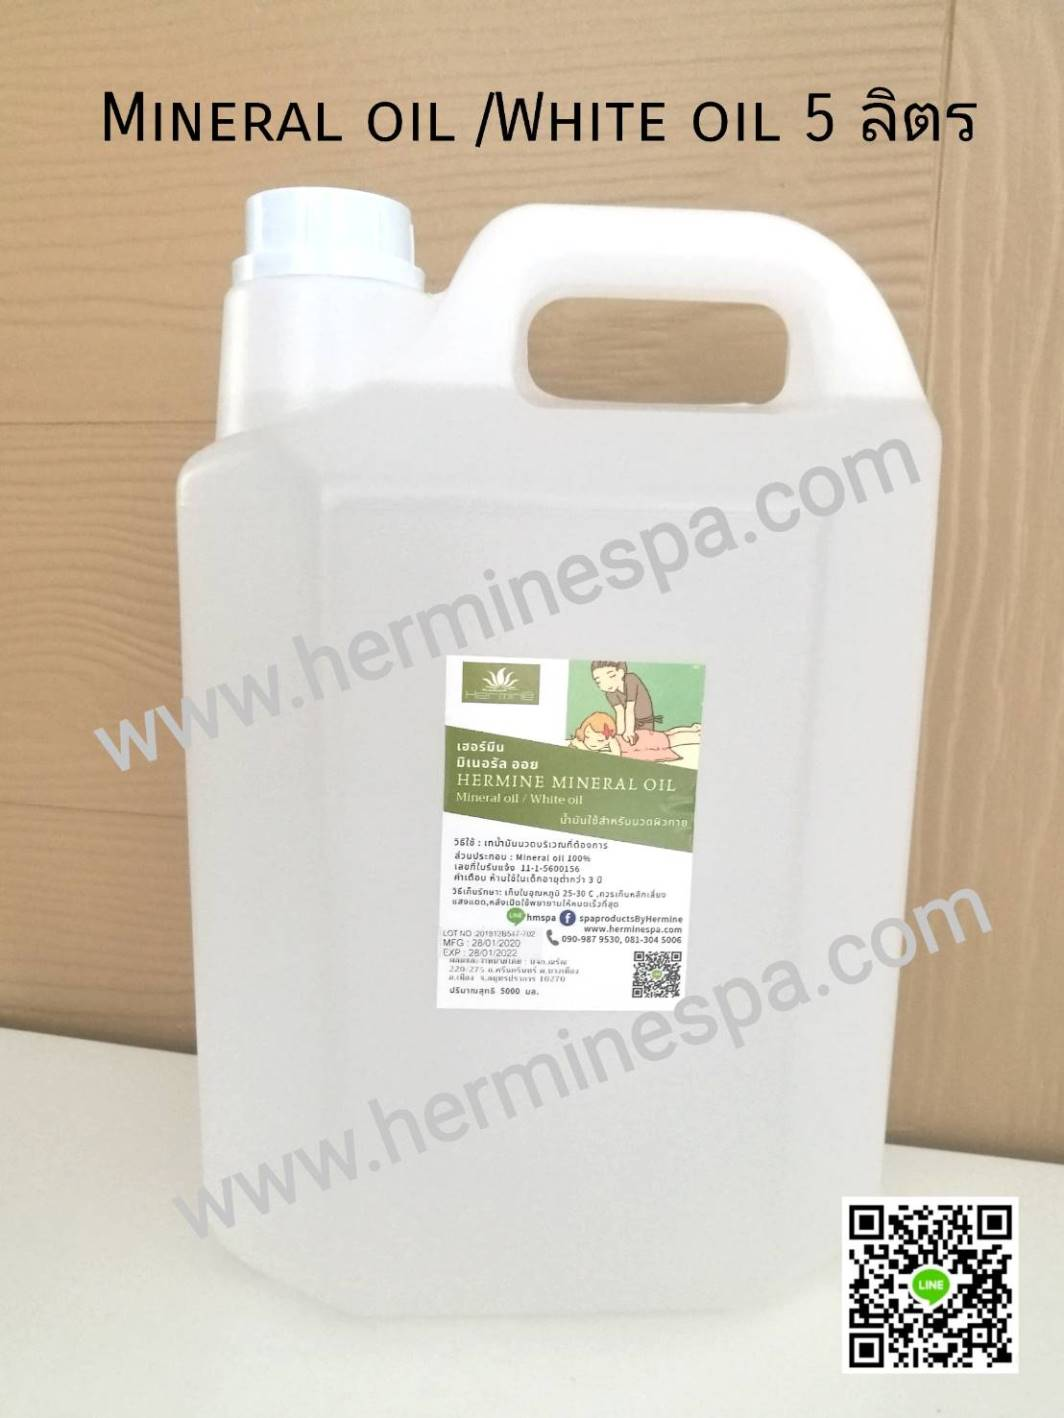 Mineral oil / White Oil / Baby oil น้ำมันไวท์ออย 5 ลิตร ♥ แบบใสไม่มีกลิ่น ♥ ราคาถูก